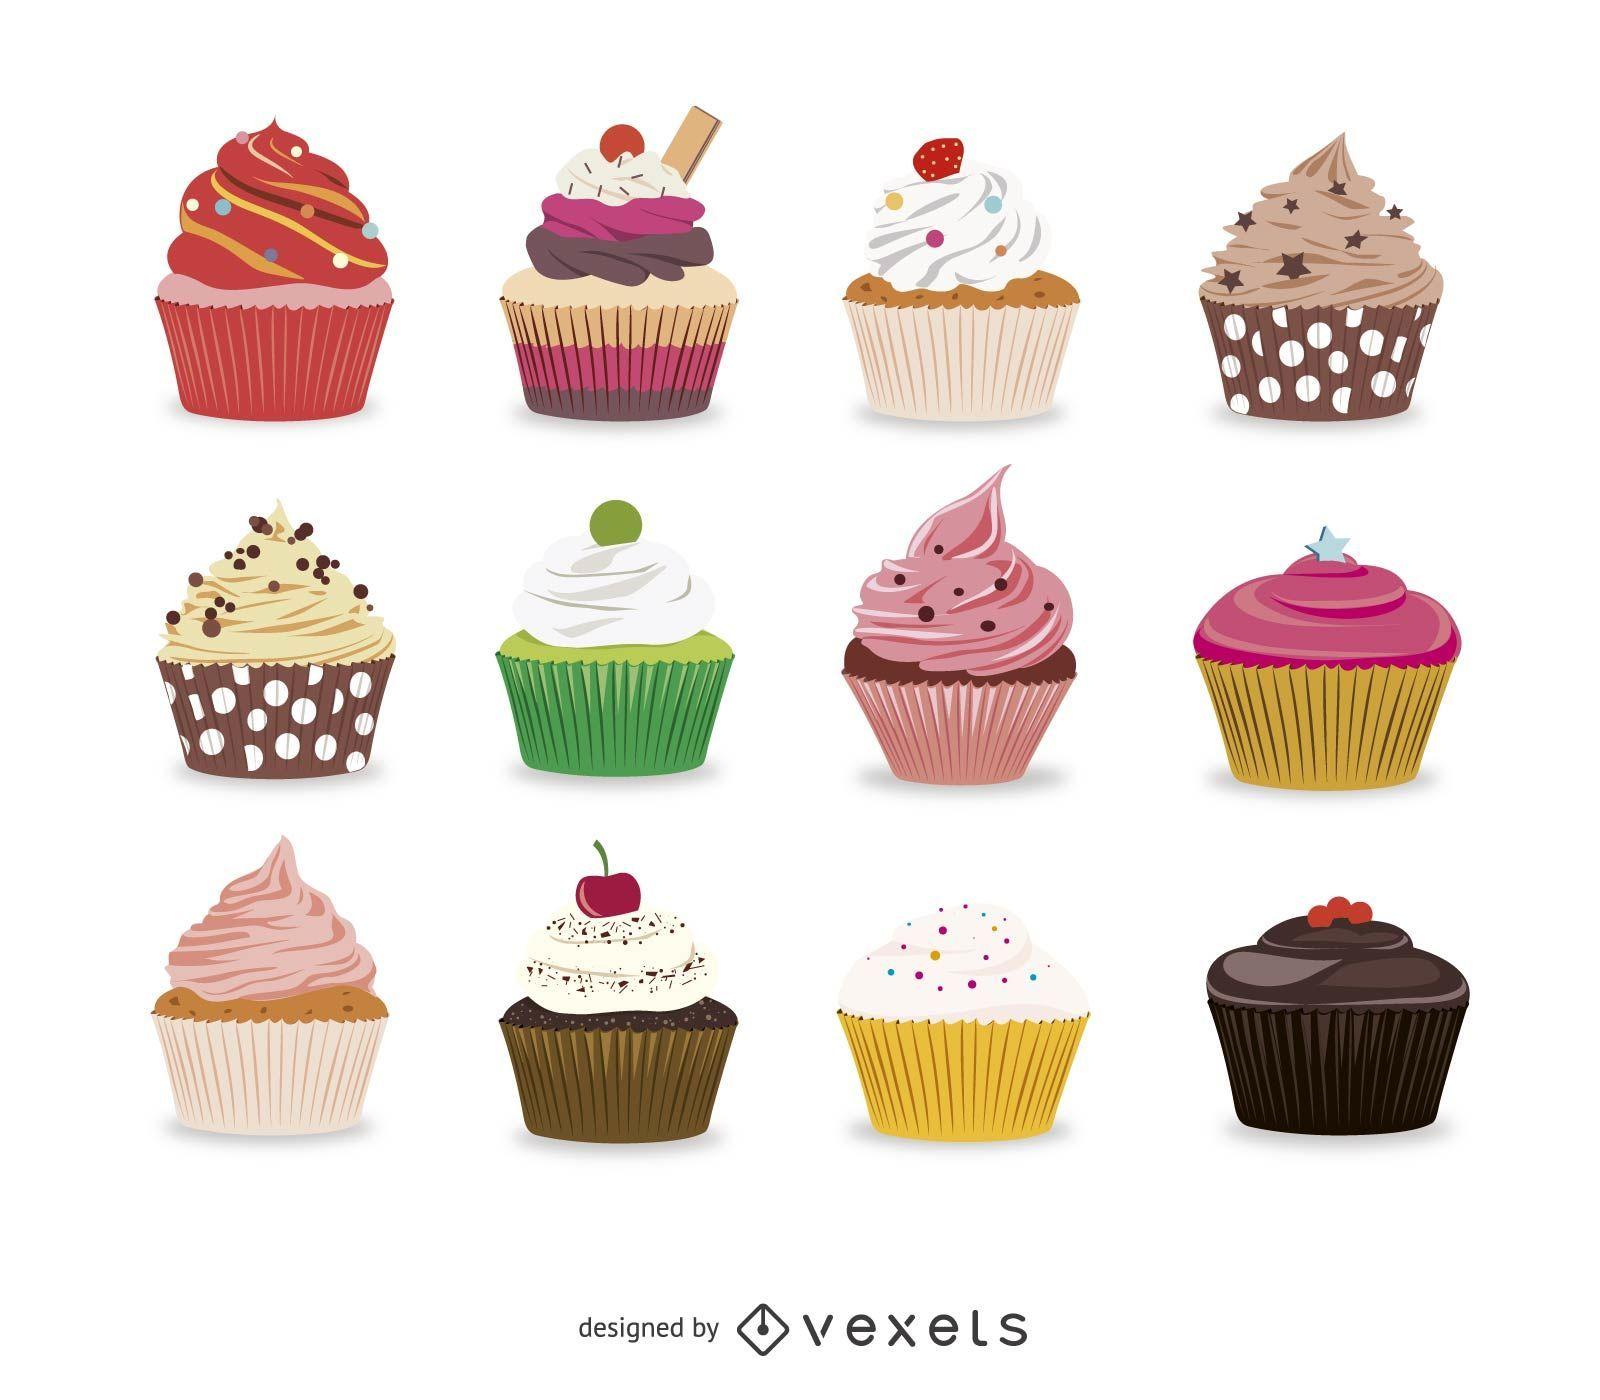 Sammlung illustrierter Cupcakes